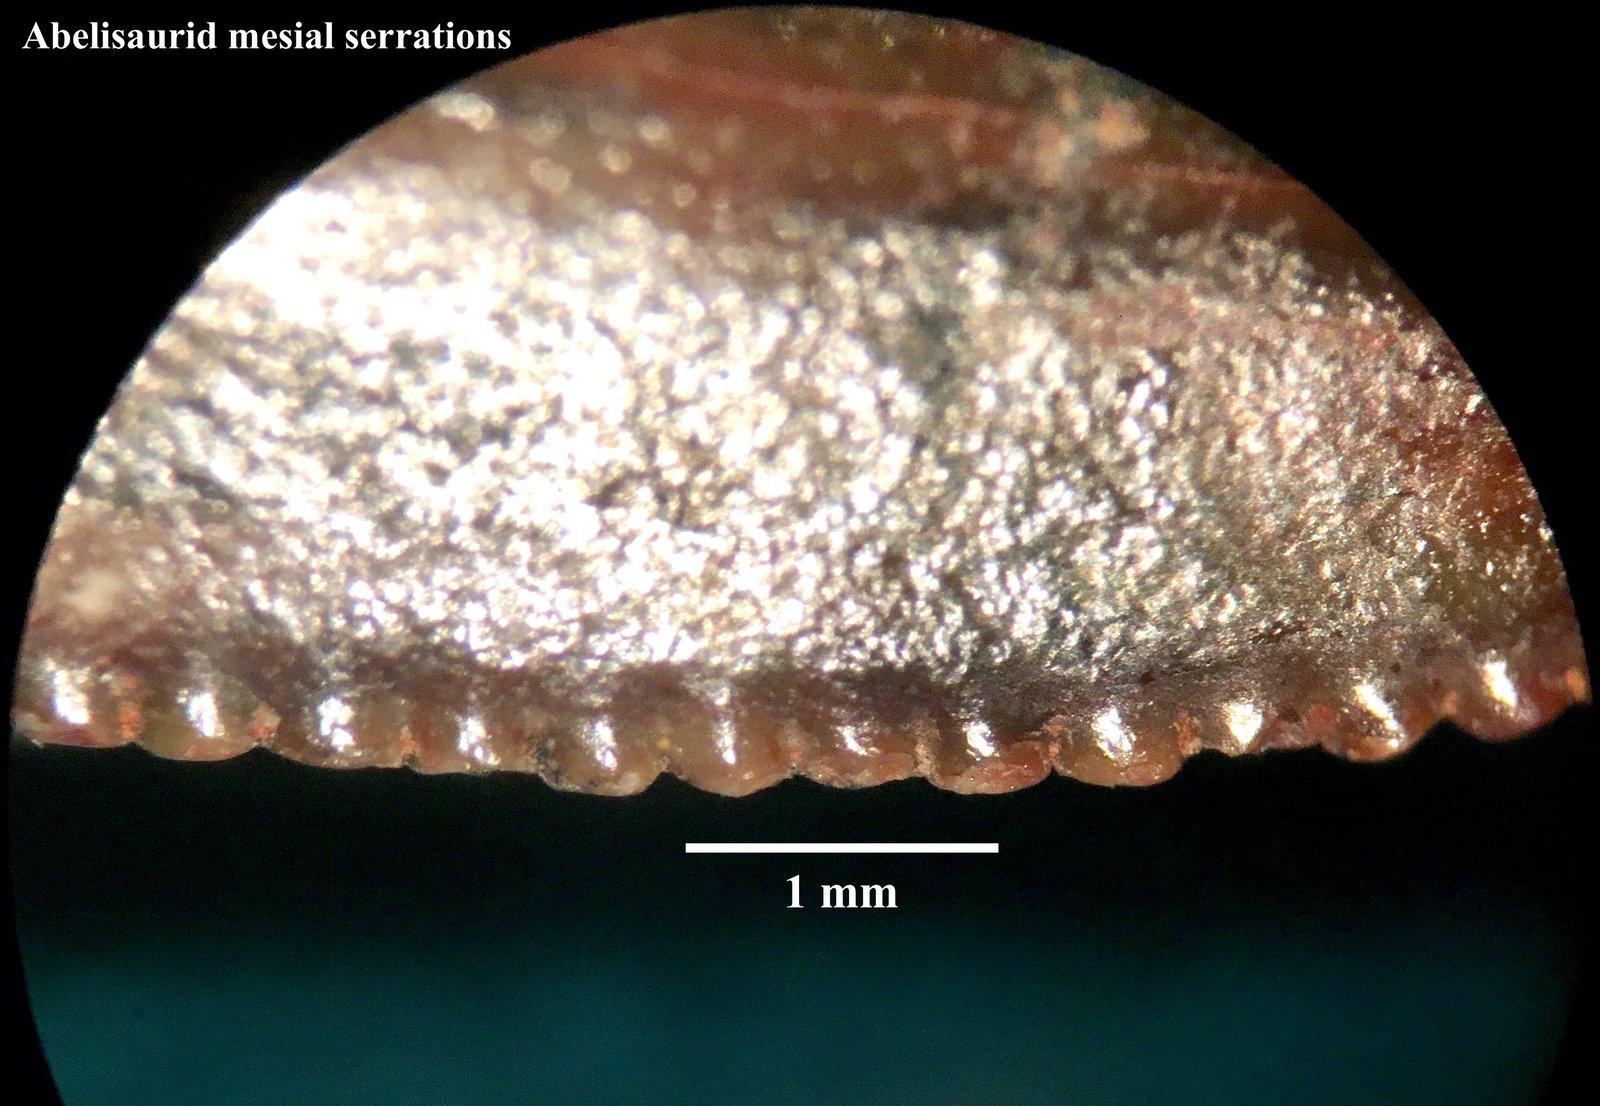 Abelisaurid mesial serrations